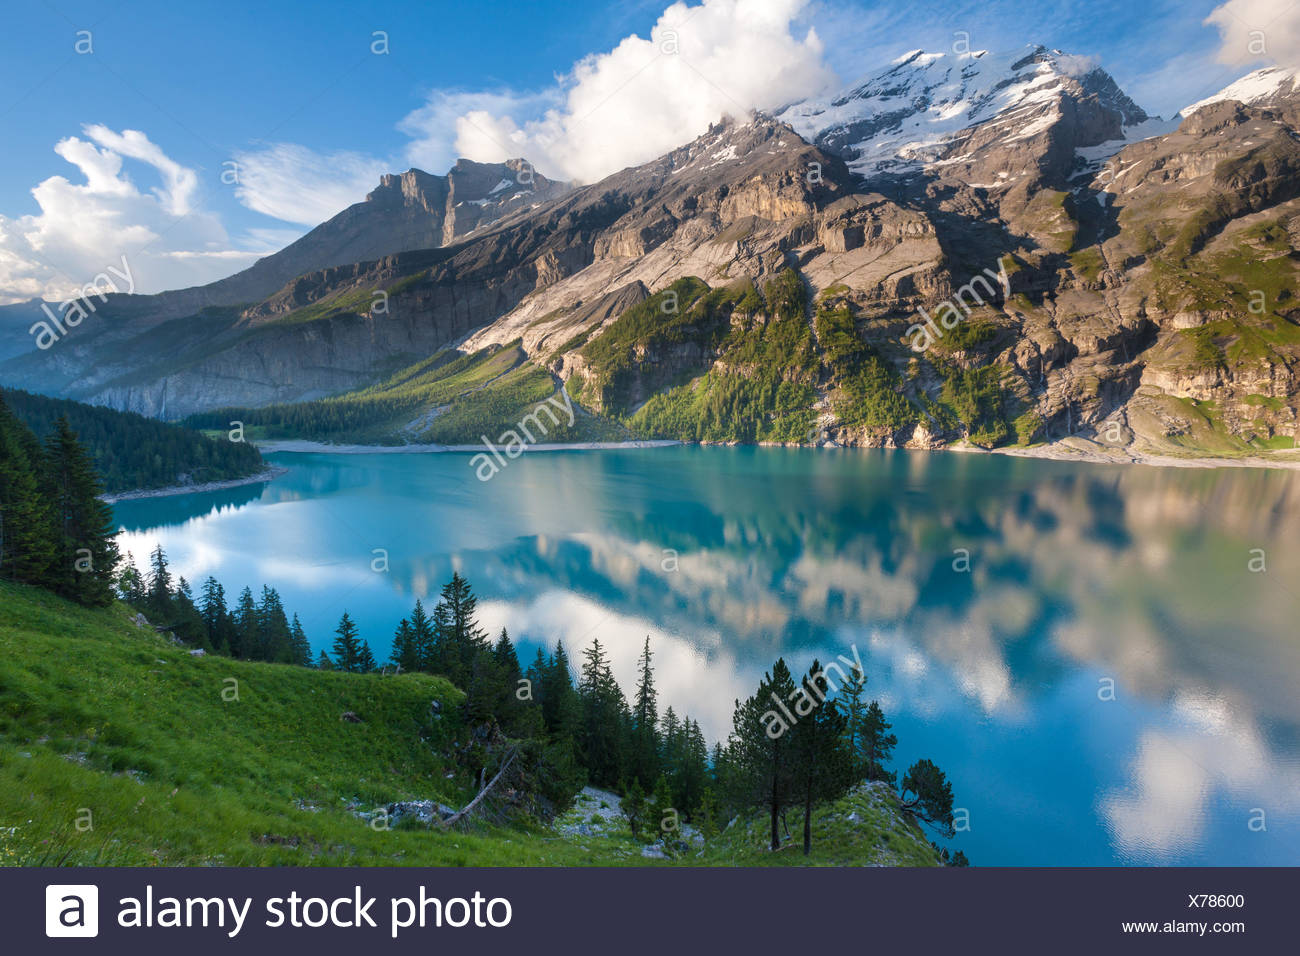 Lago de Oeschinen, Suiza, Europa, cantón de Berna, en el Oberland Bernés Kandertal, lago de montaña, el lago, las montañas, la reflexión Foto de stock